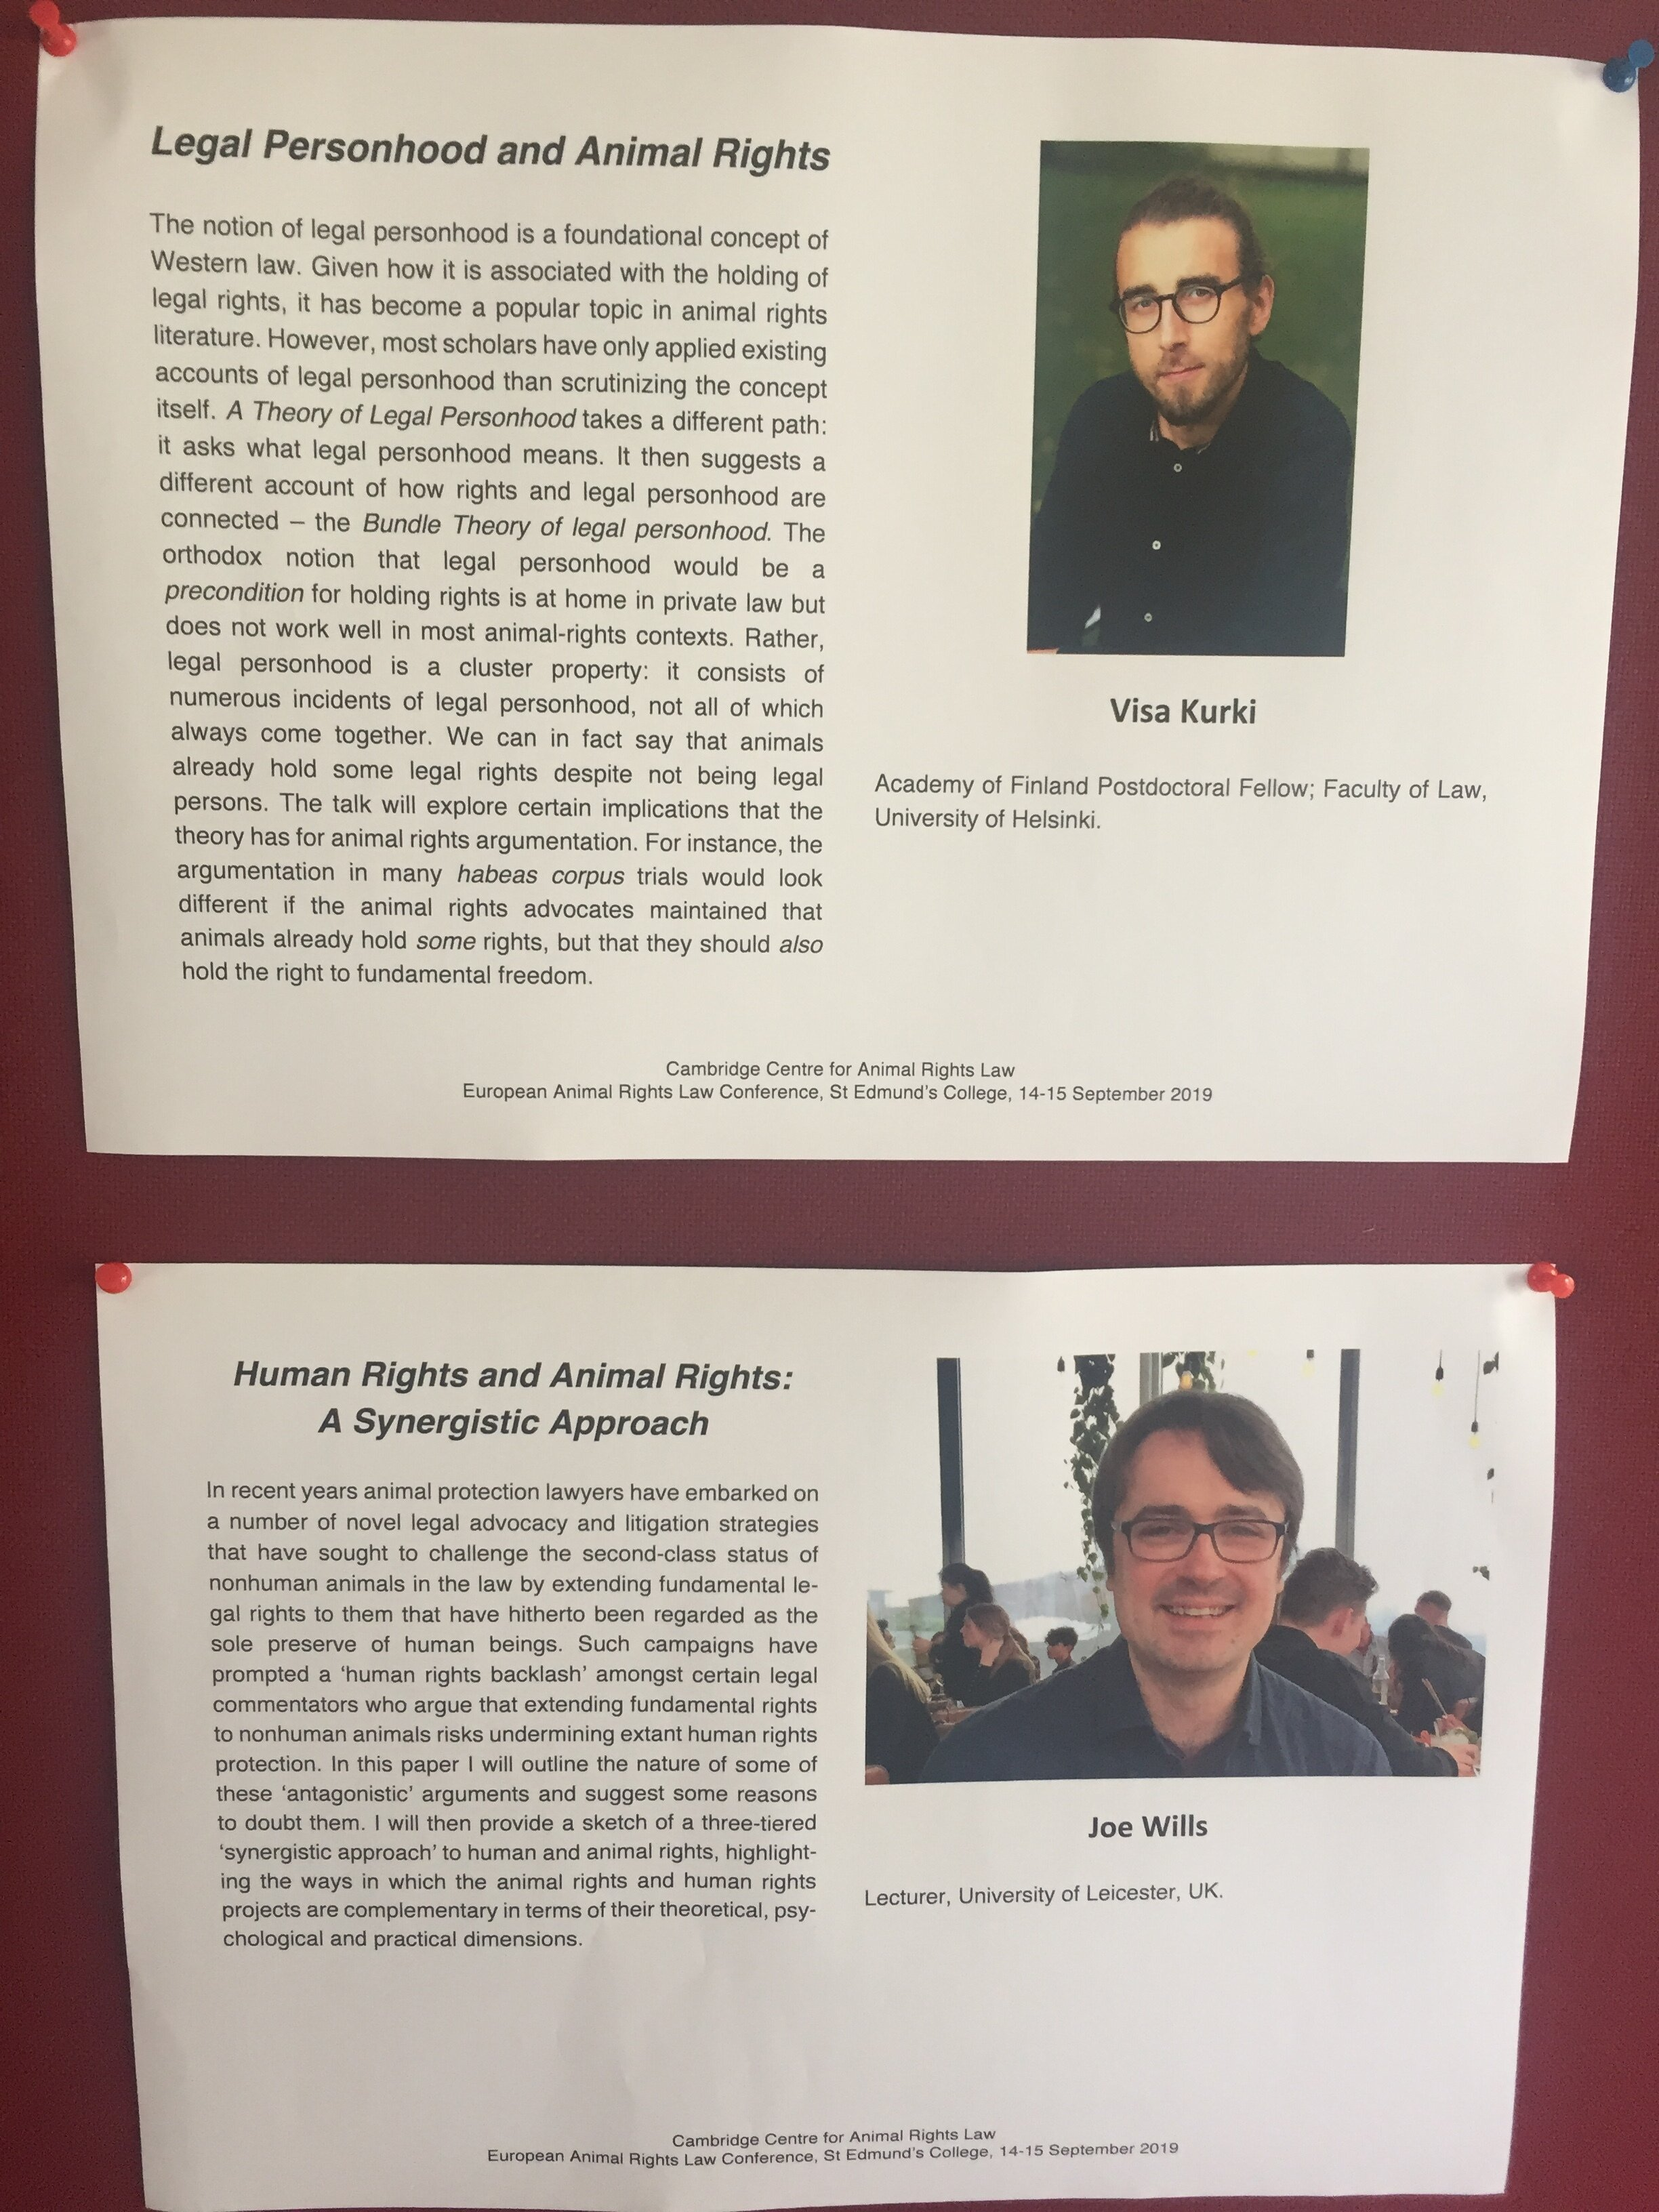 Posters of Visa Kurki's and Joe Will's presentations